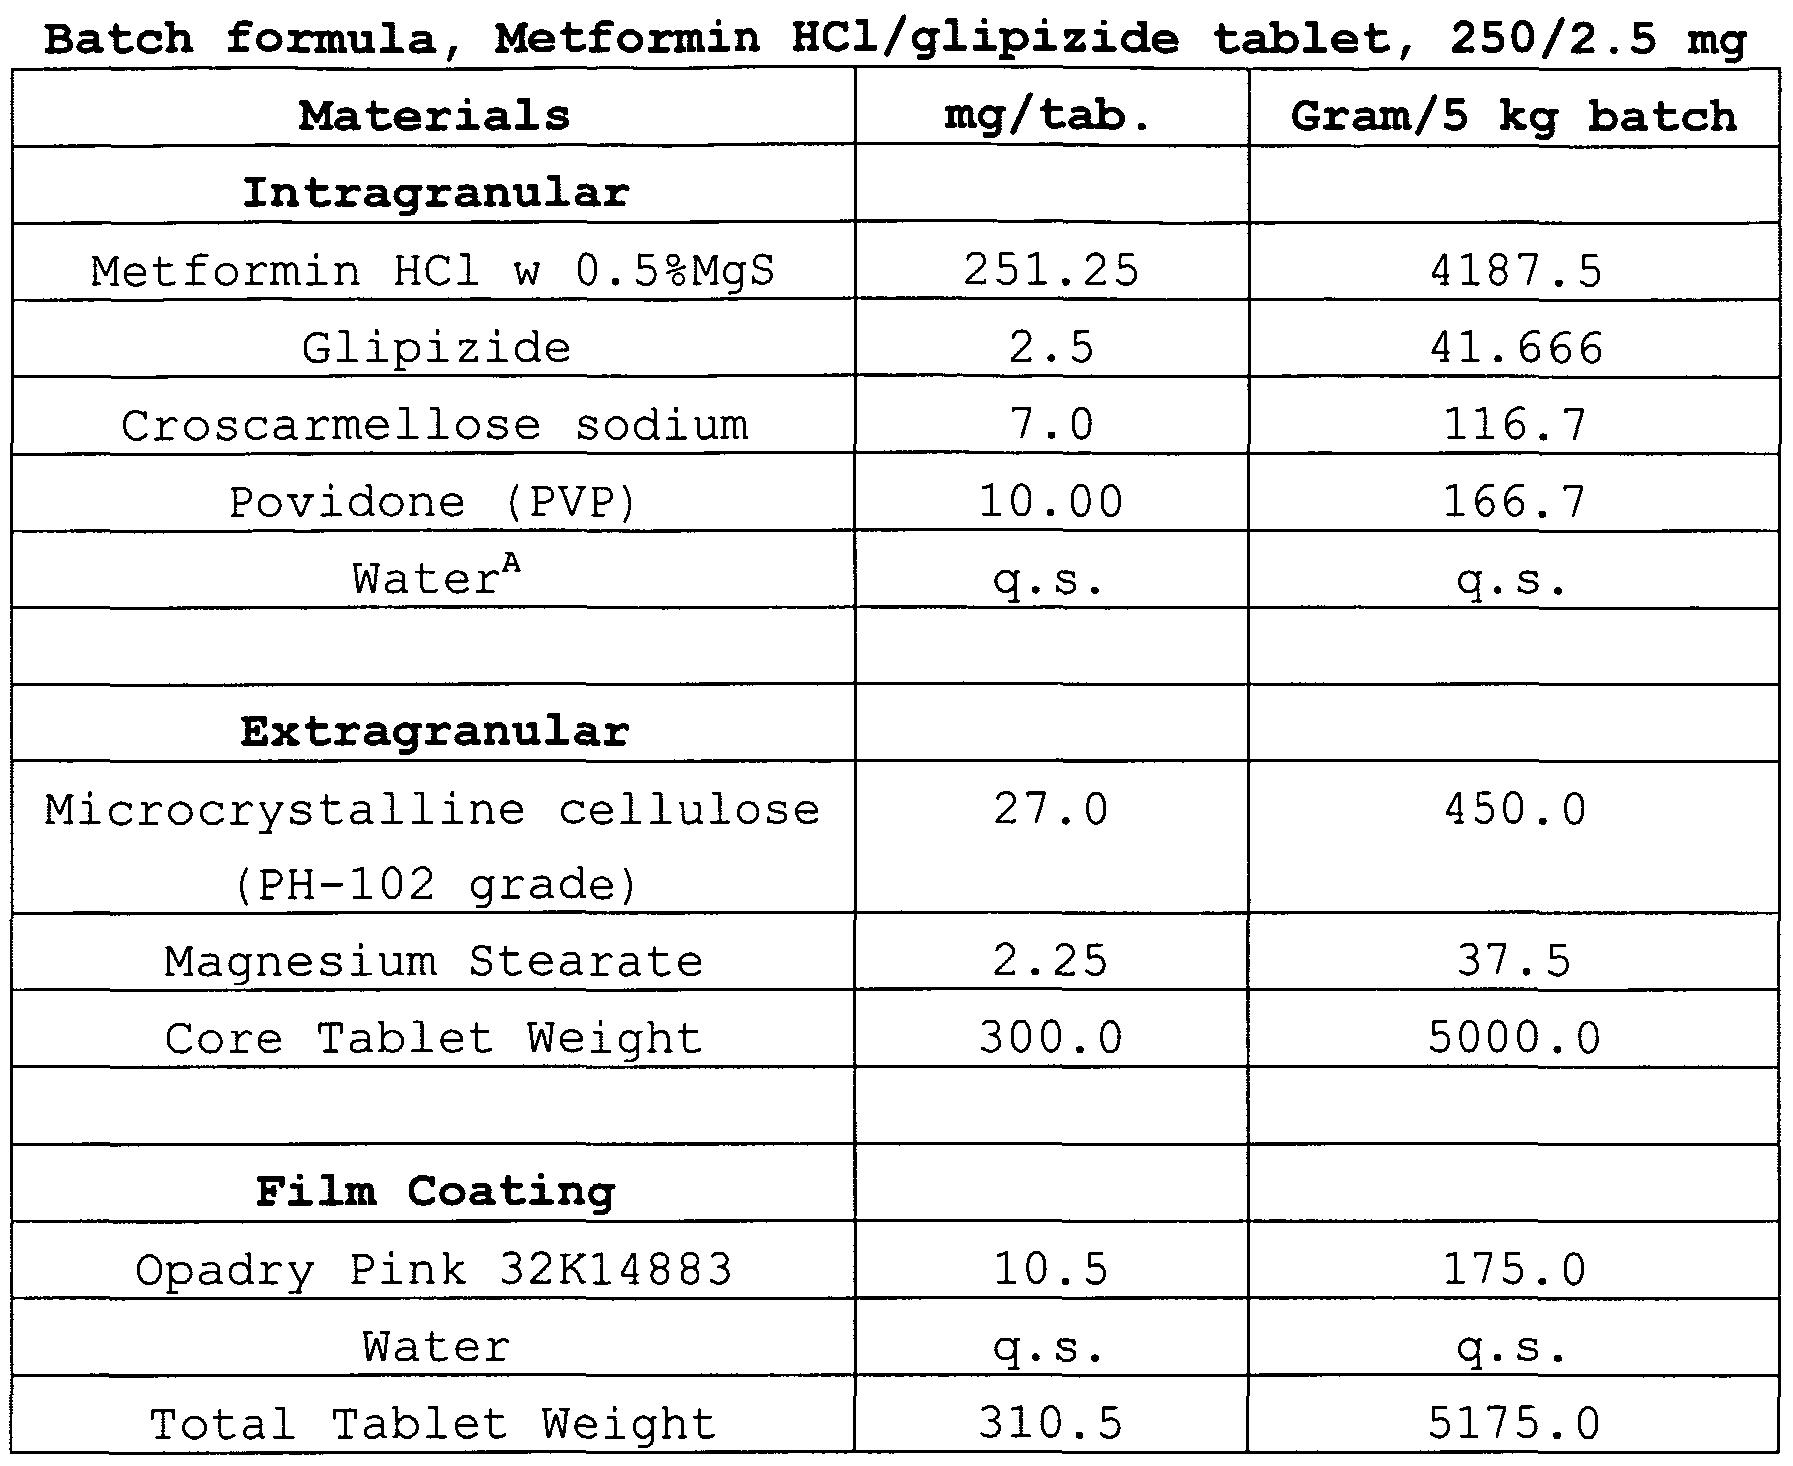 Glucophage 1000 mg tab.doc - Figure Imgf000025_0001